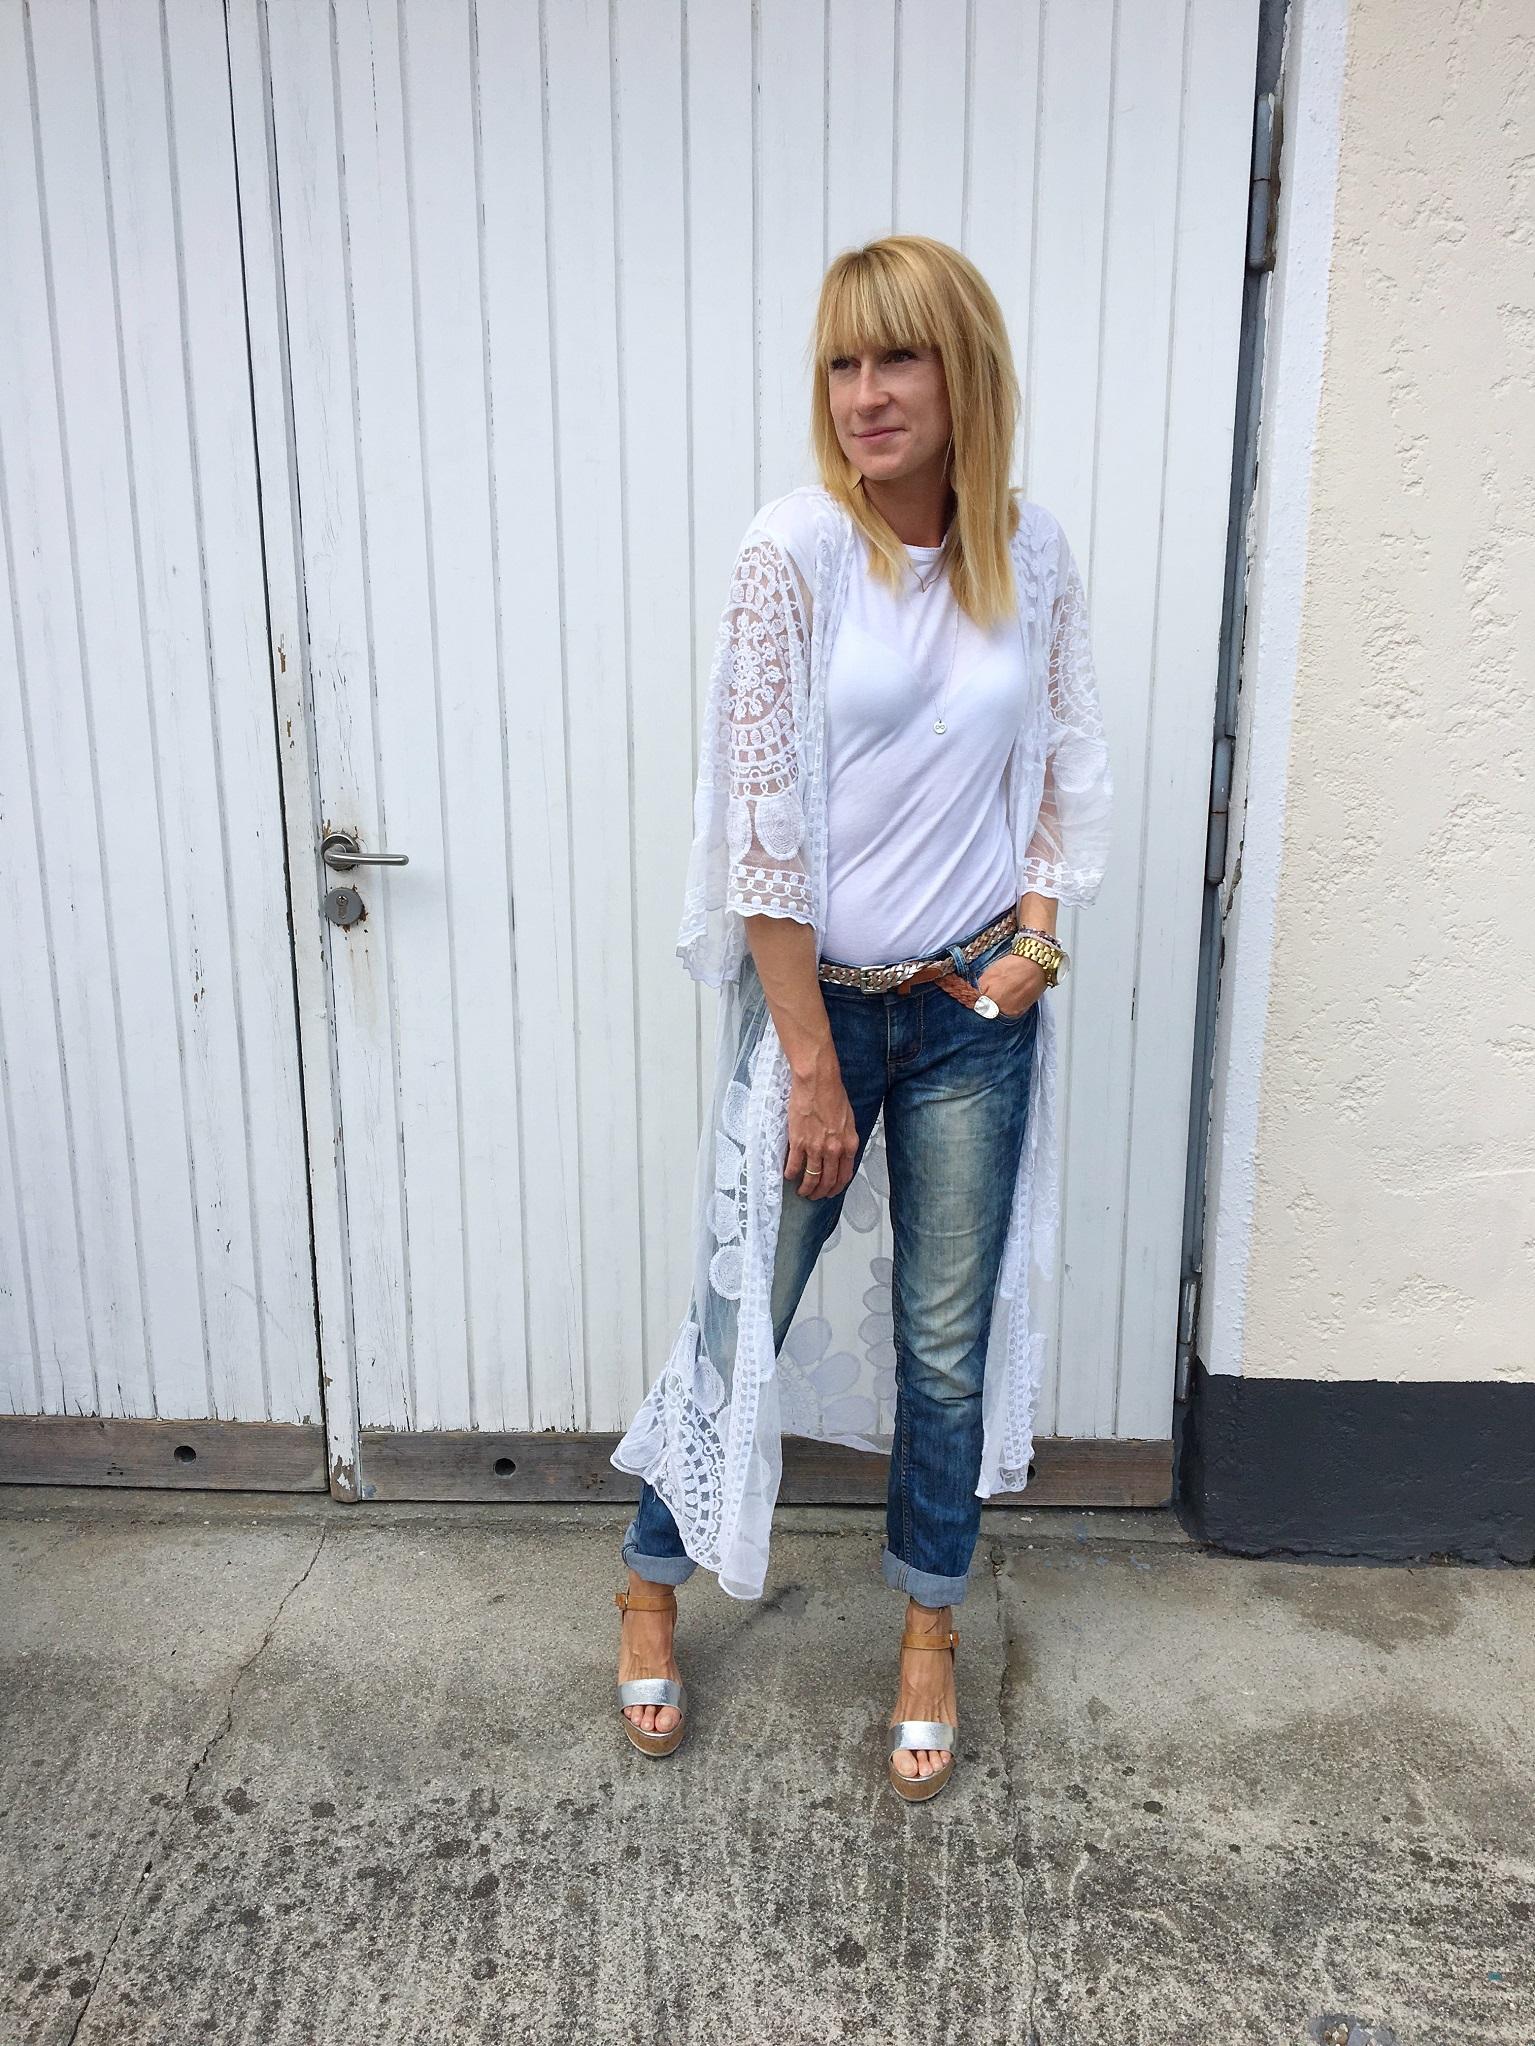 Mein neuer Jeanslook im Boho Style